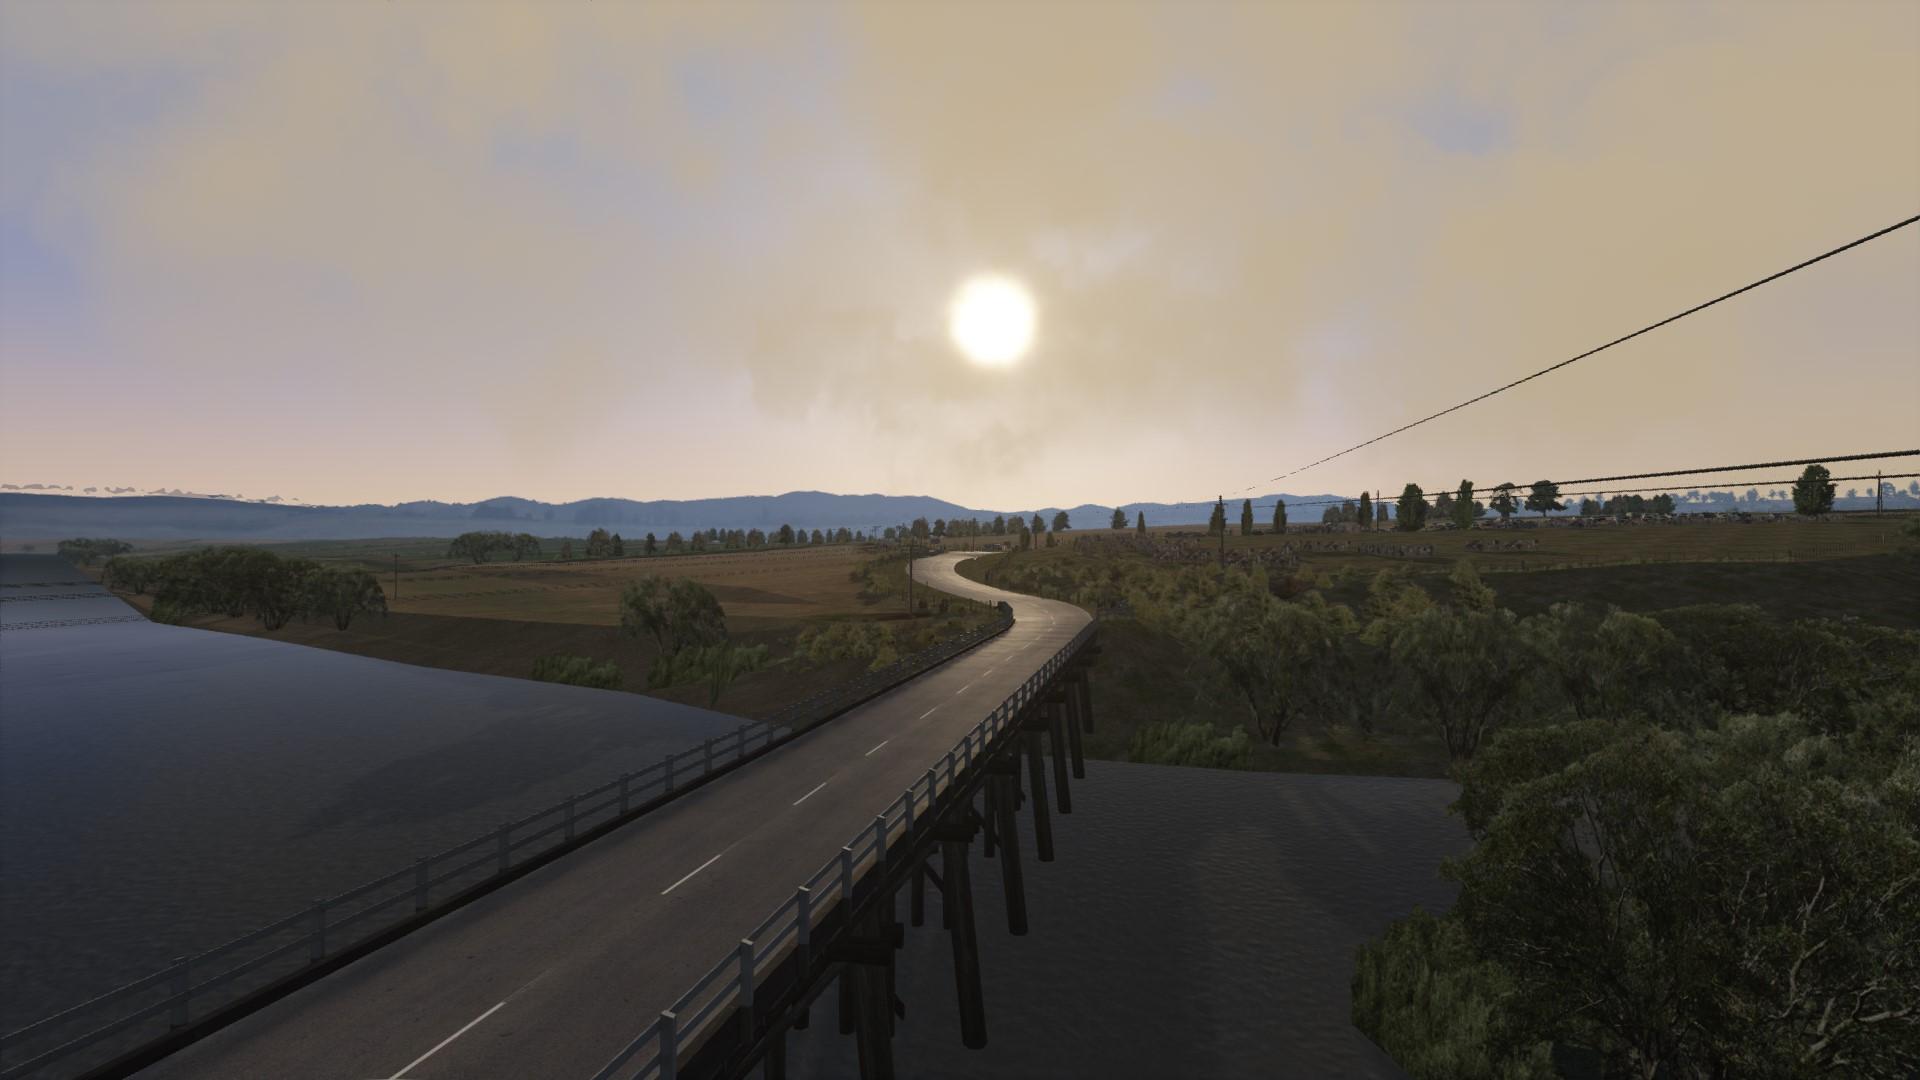 Screenshot_renault_meg250_longford_67_13-4-116-12-21-19.jpg